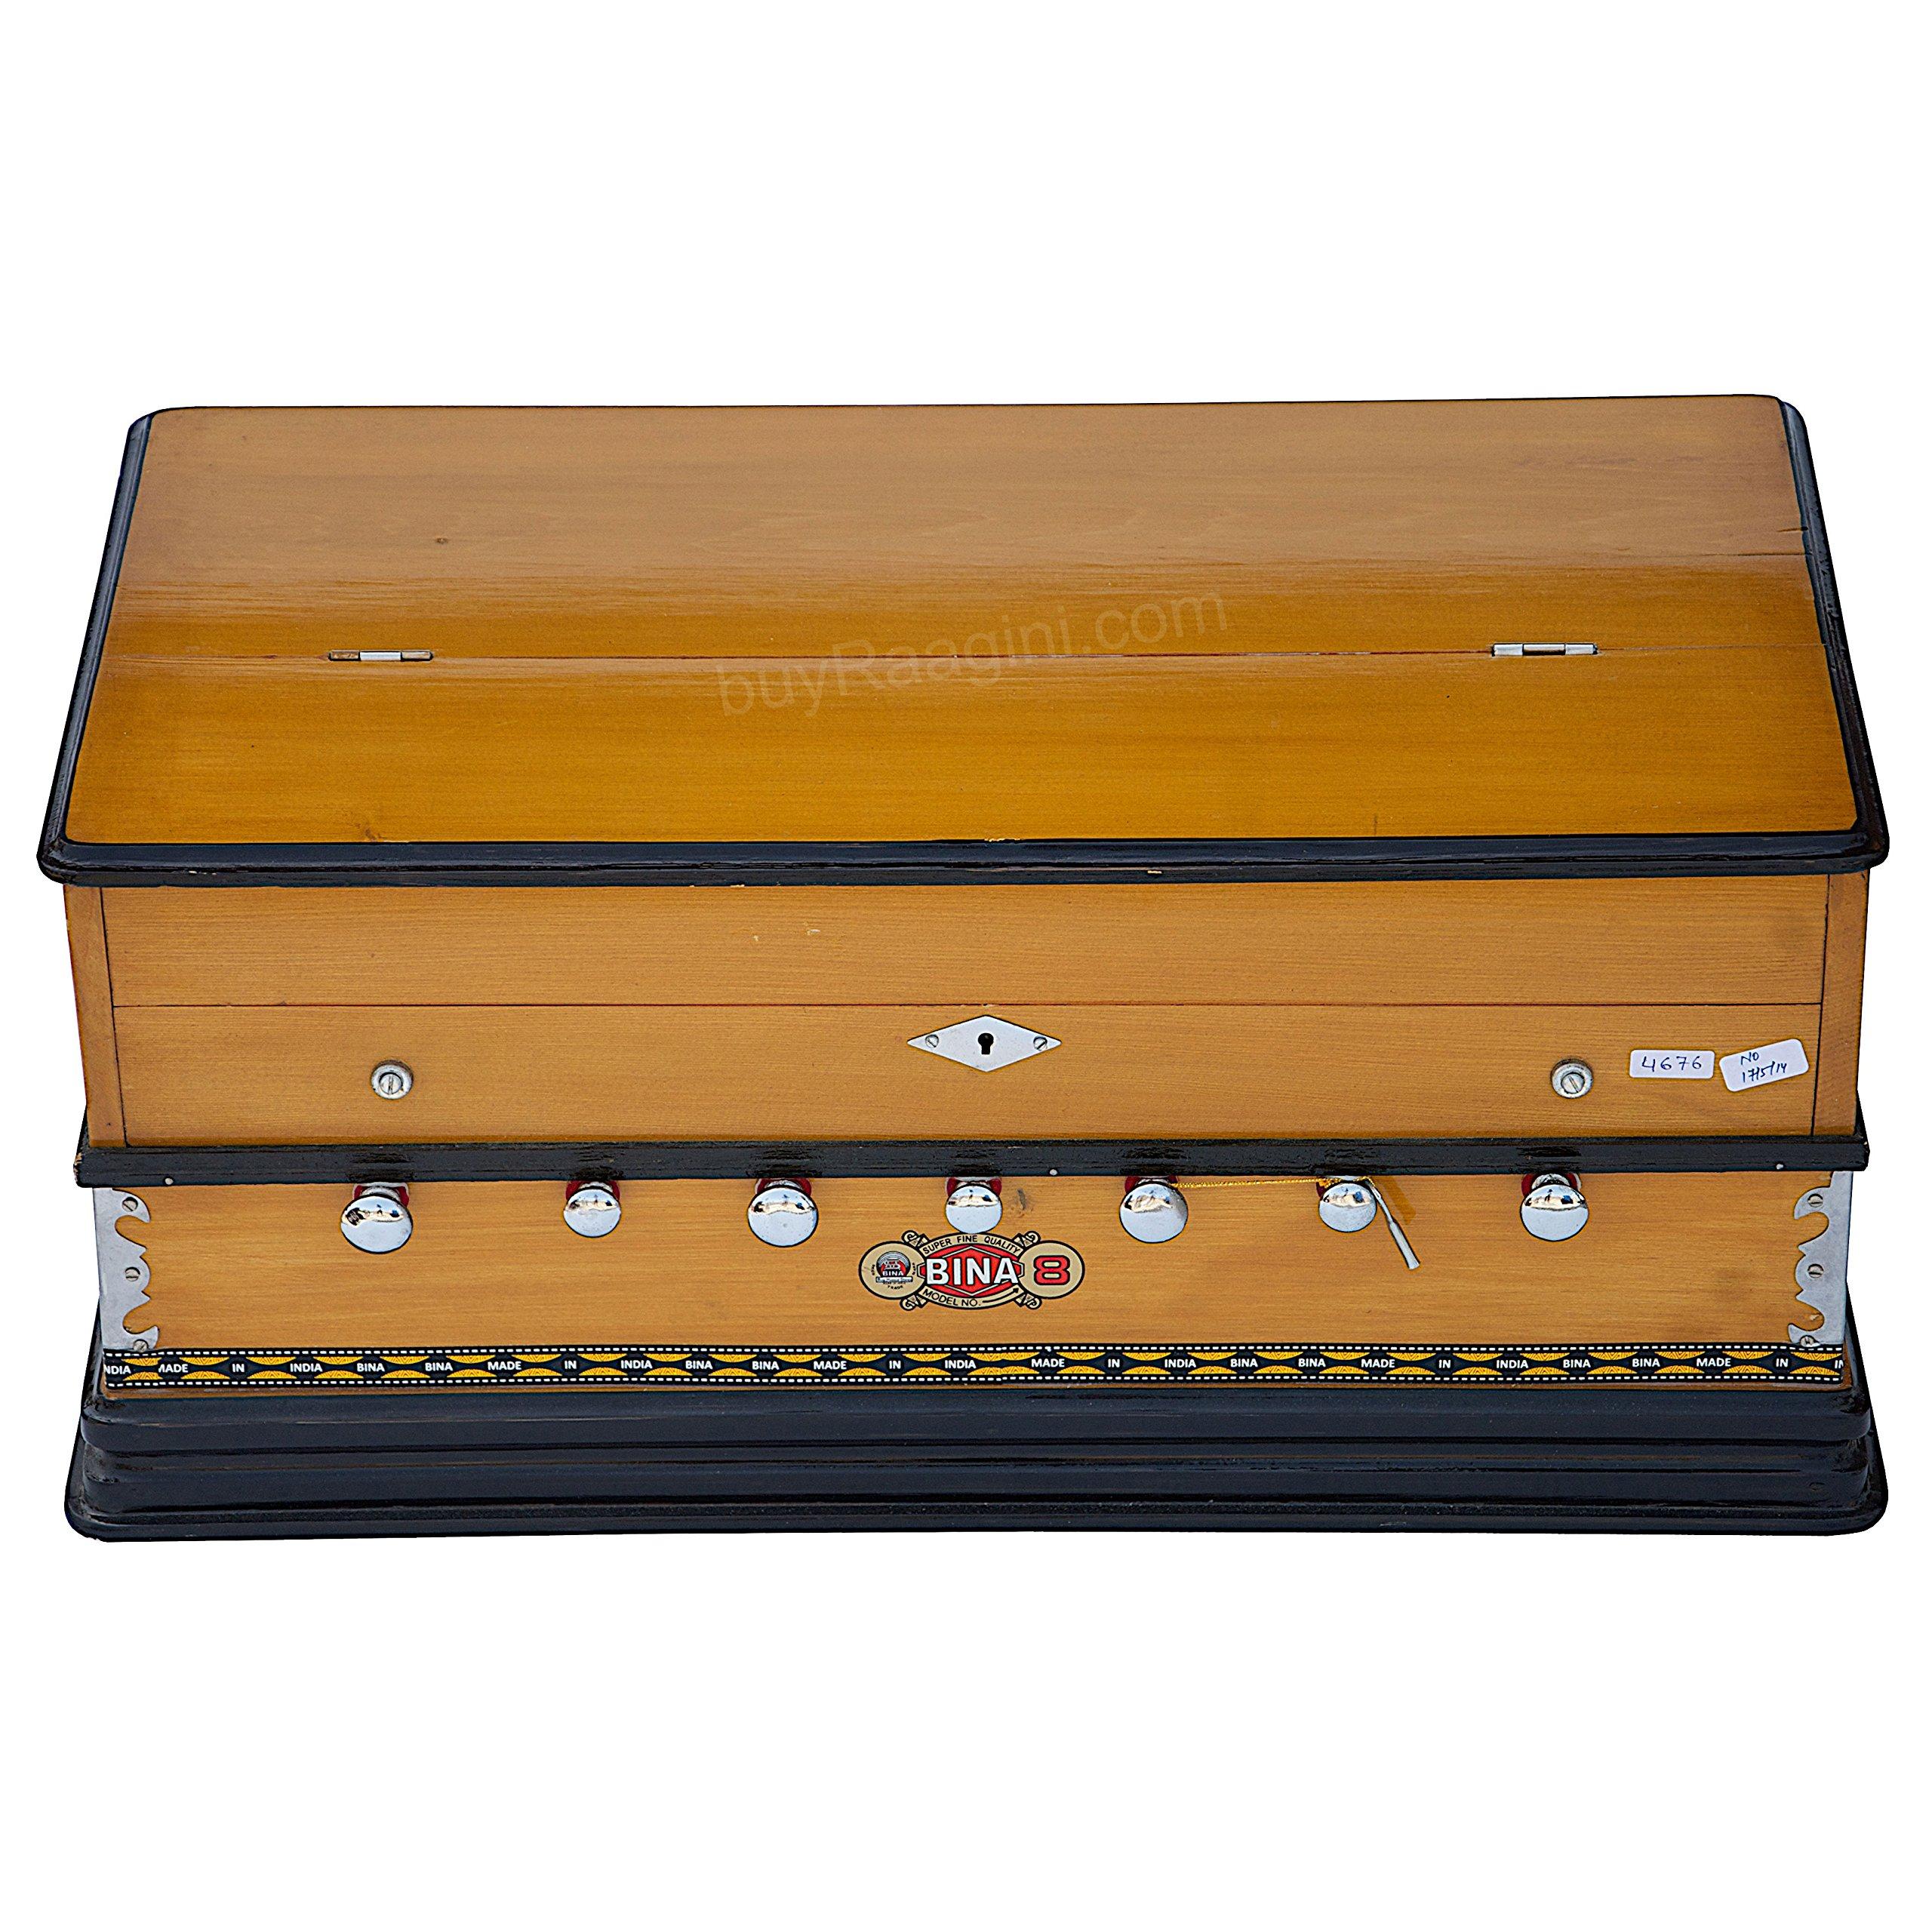 Harmonium Musical Instrument, BINA No. 8, 7 Stops, 3 1/4 Octaves, Coupler, Tuned To A400, Double Reed, Natural Color, Book, Nylon Bag (PDI-DJF) by Bina (Image #8)